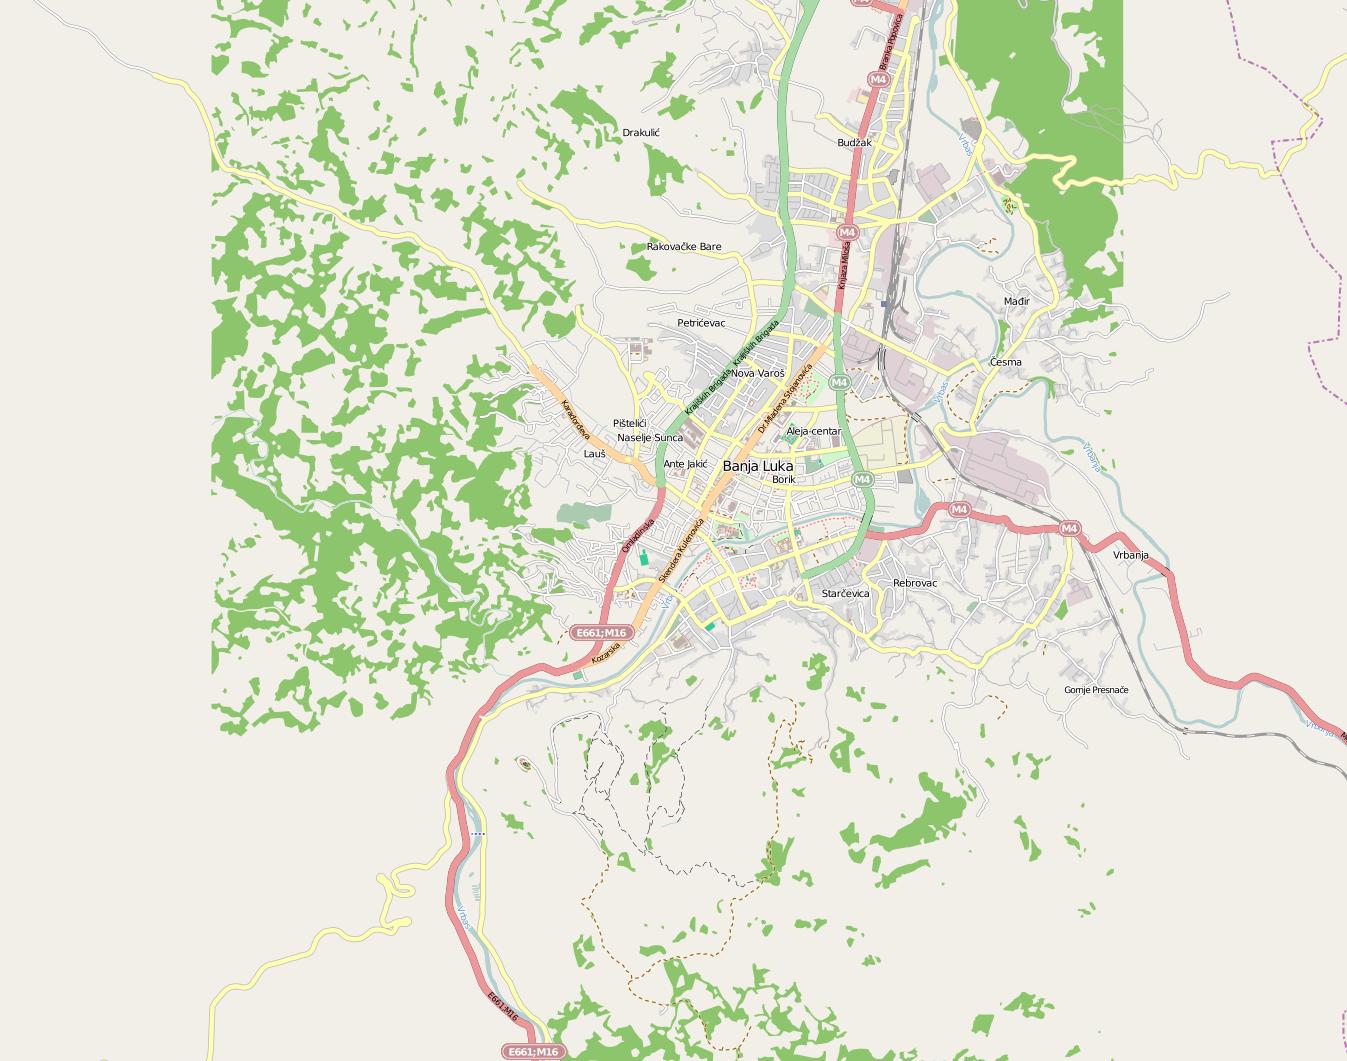 banja luka mapa Файл:Mapa položaja Banja Luka.png — Википедия banja luka mapa